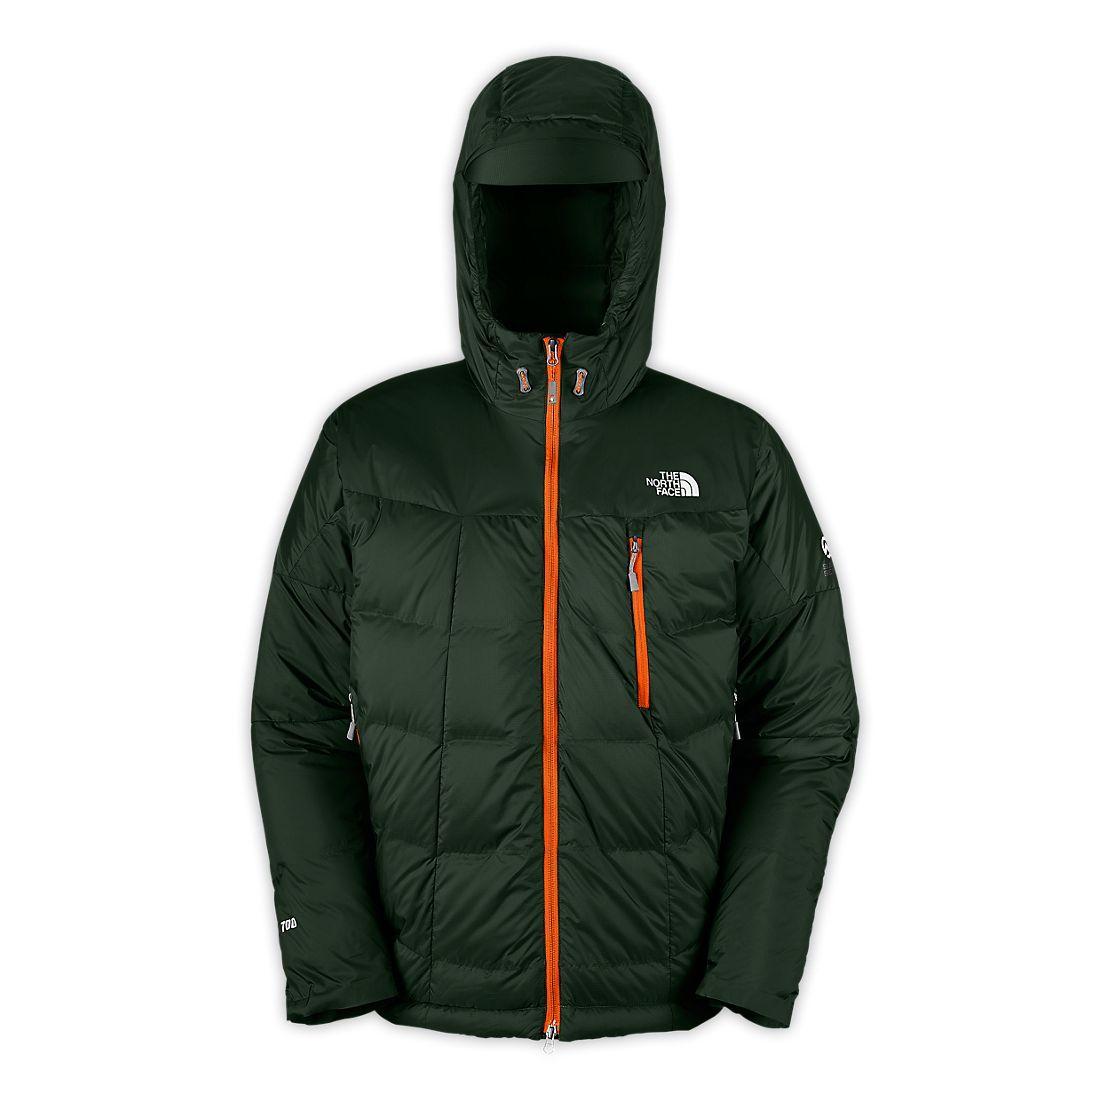 ... The North Face Mens Jackets Vests MENS PRISM OPTIMUS JACKET ... 966bb3a66